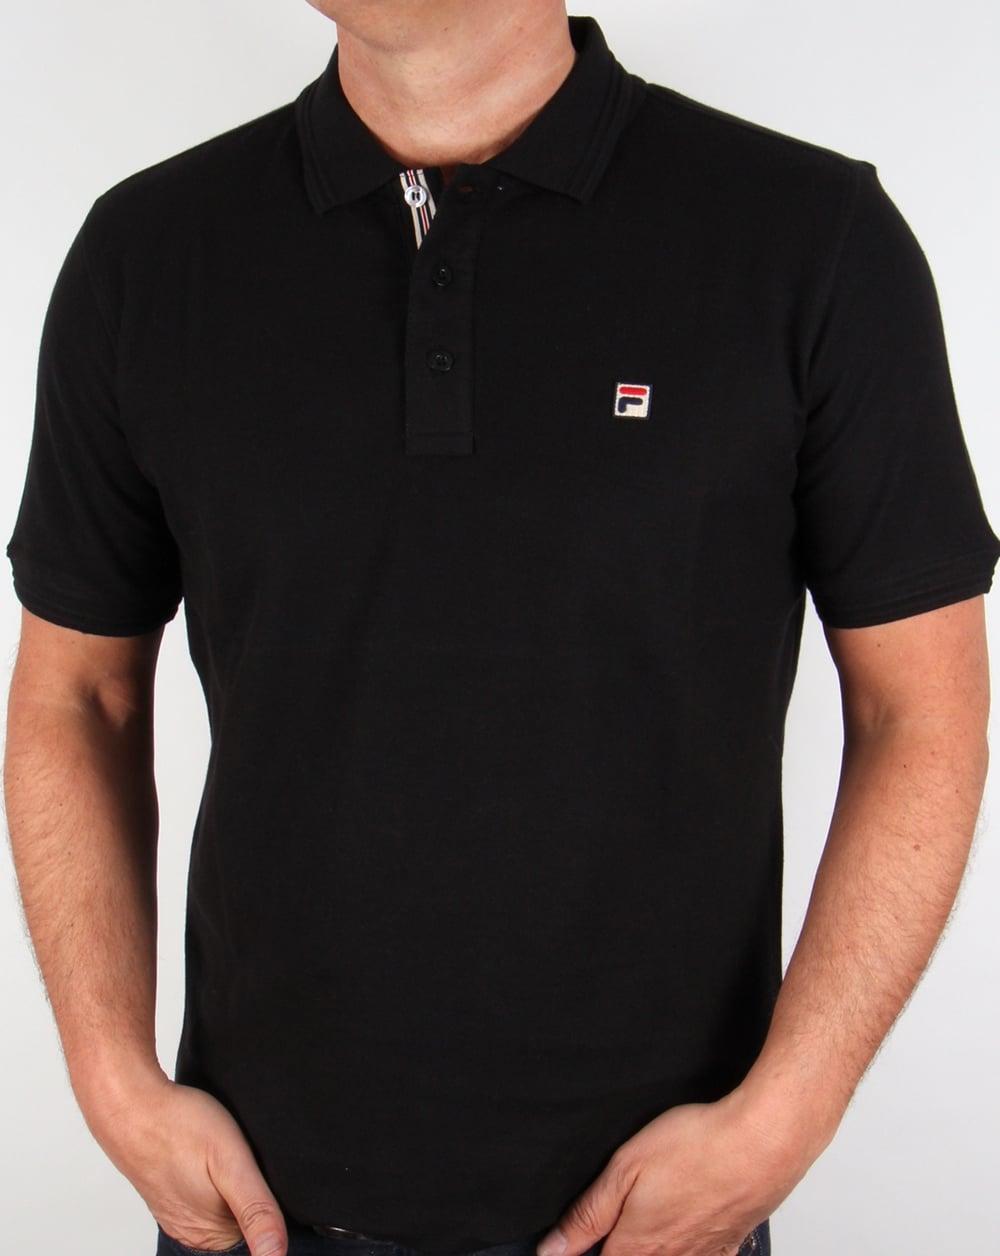 Fila Vintage Smarta Polo Shirt Black